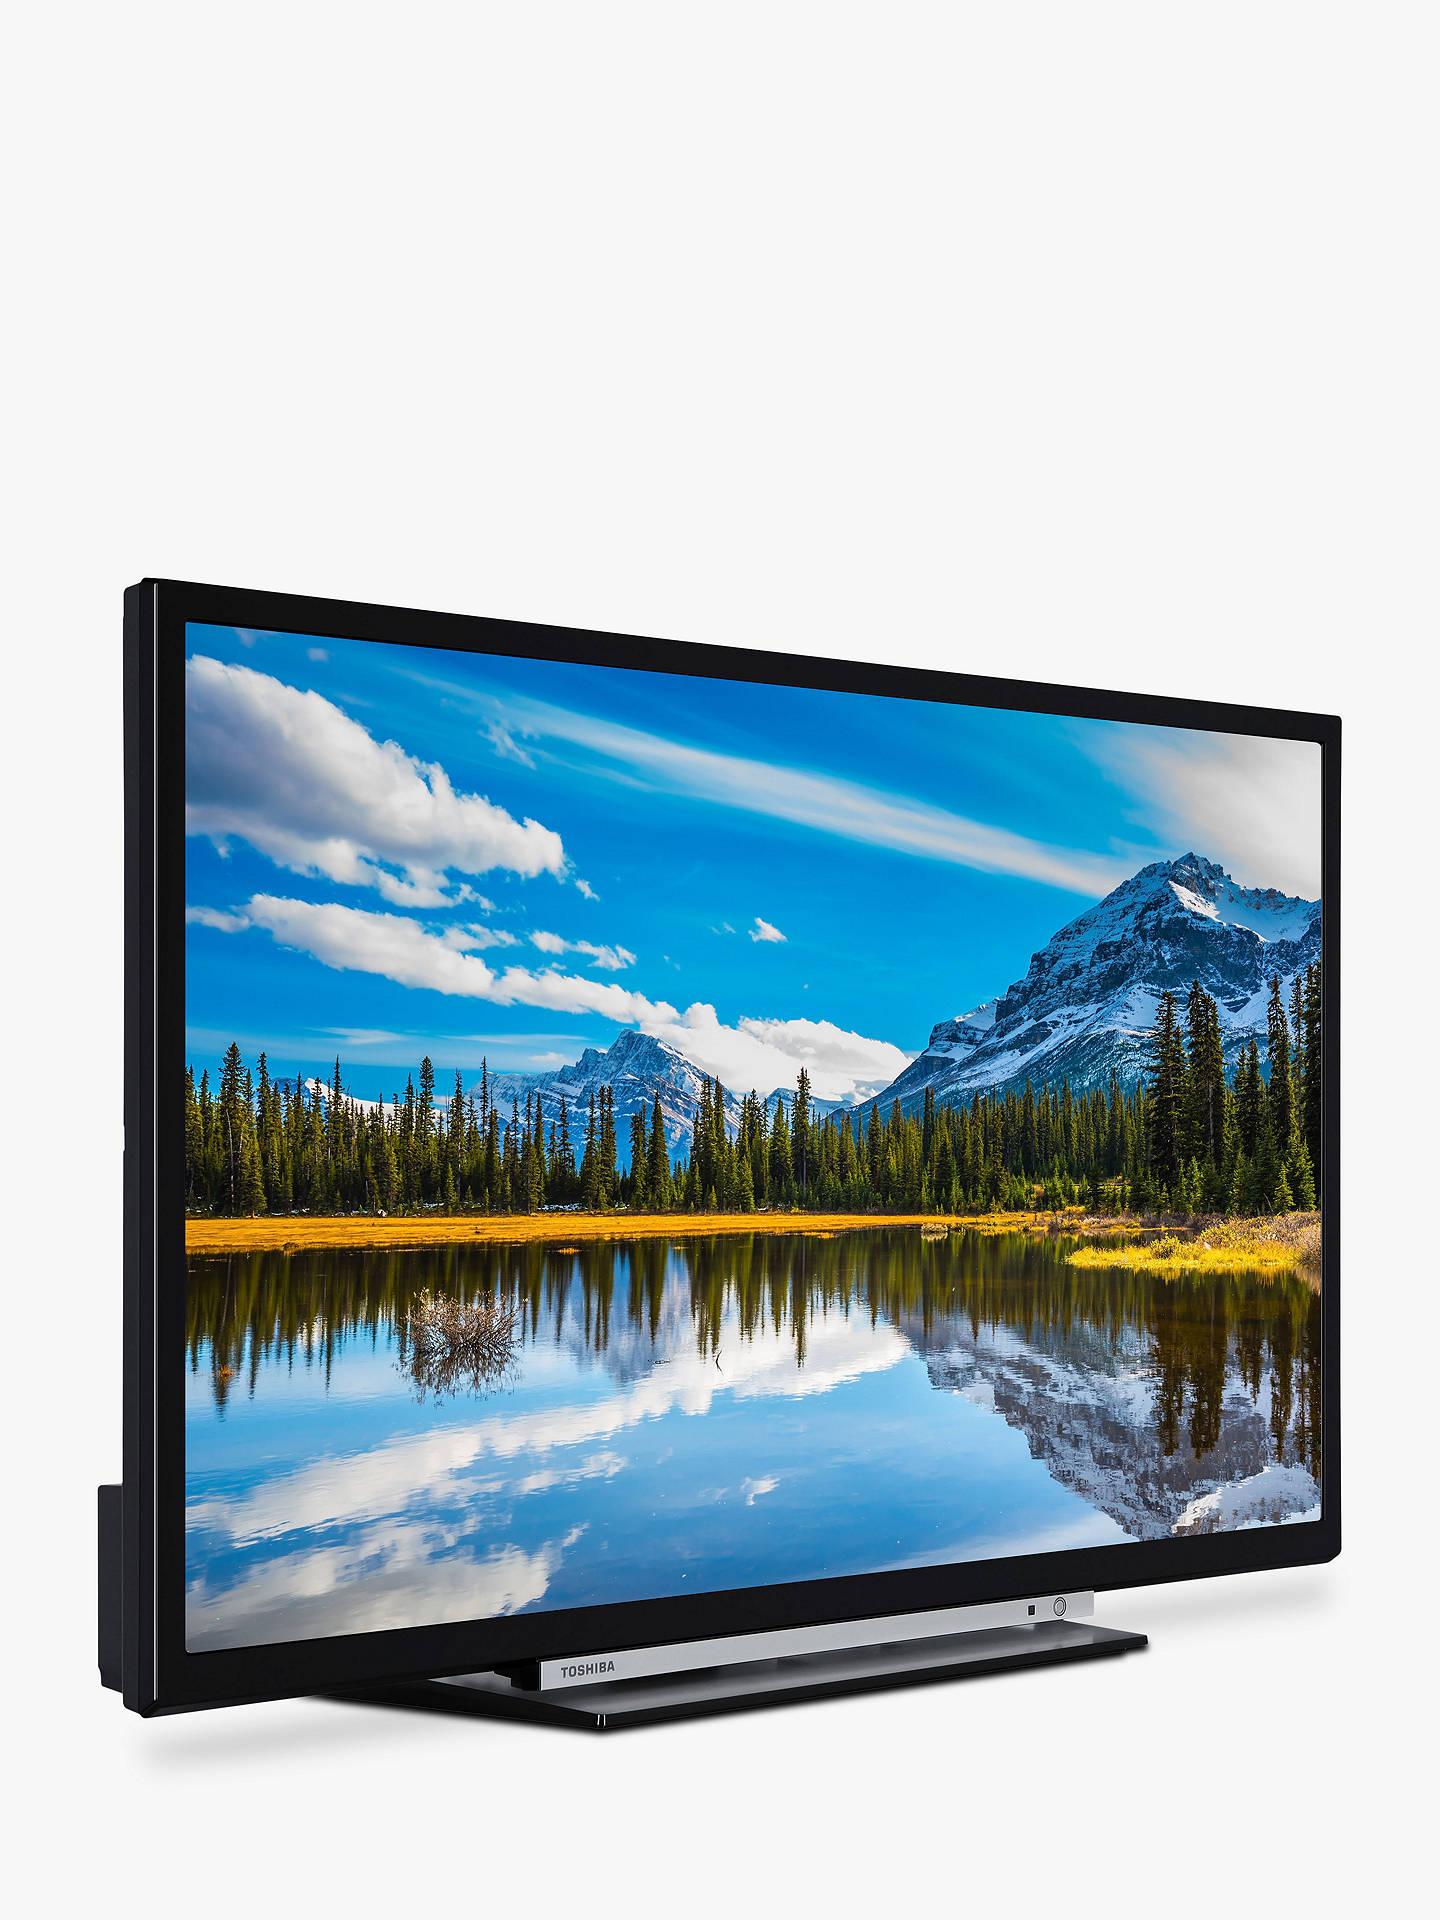 Toshiba 24W3863DB LED HD Ready 720p Smart TV, 24